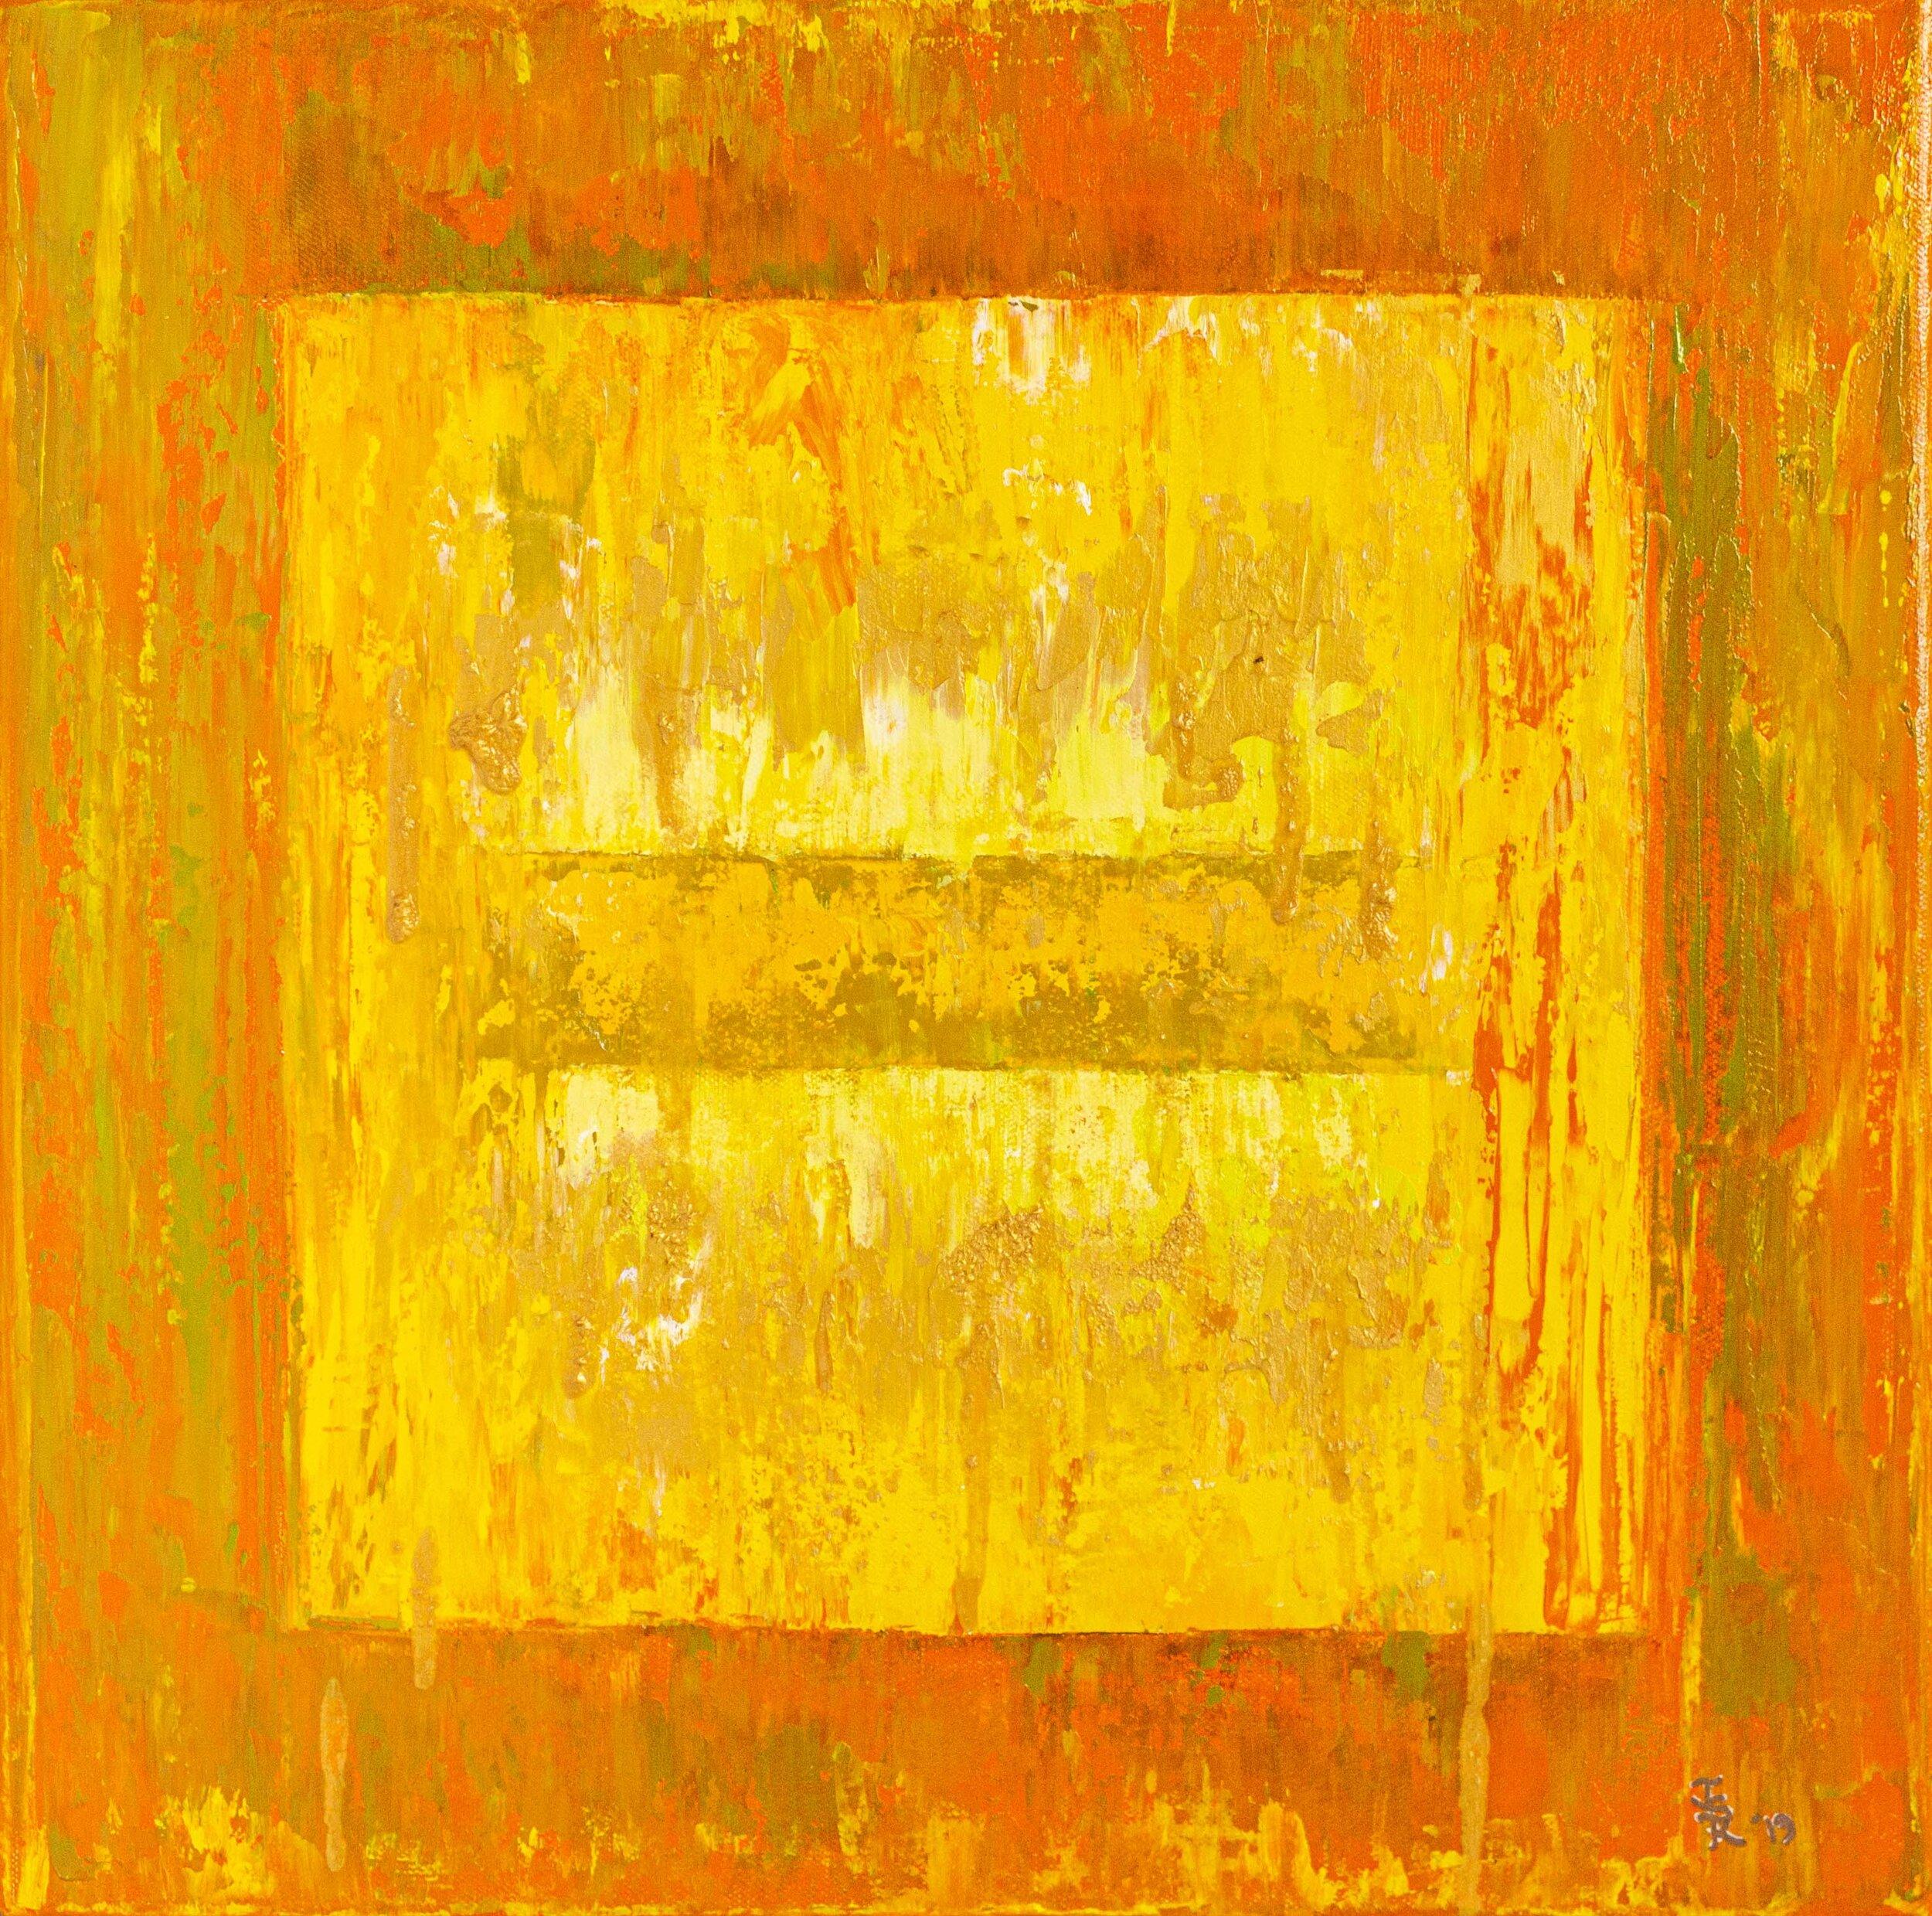 Ice Cube Small Orange & Yellow, 2019